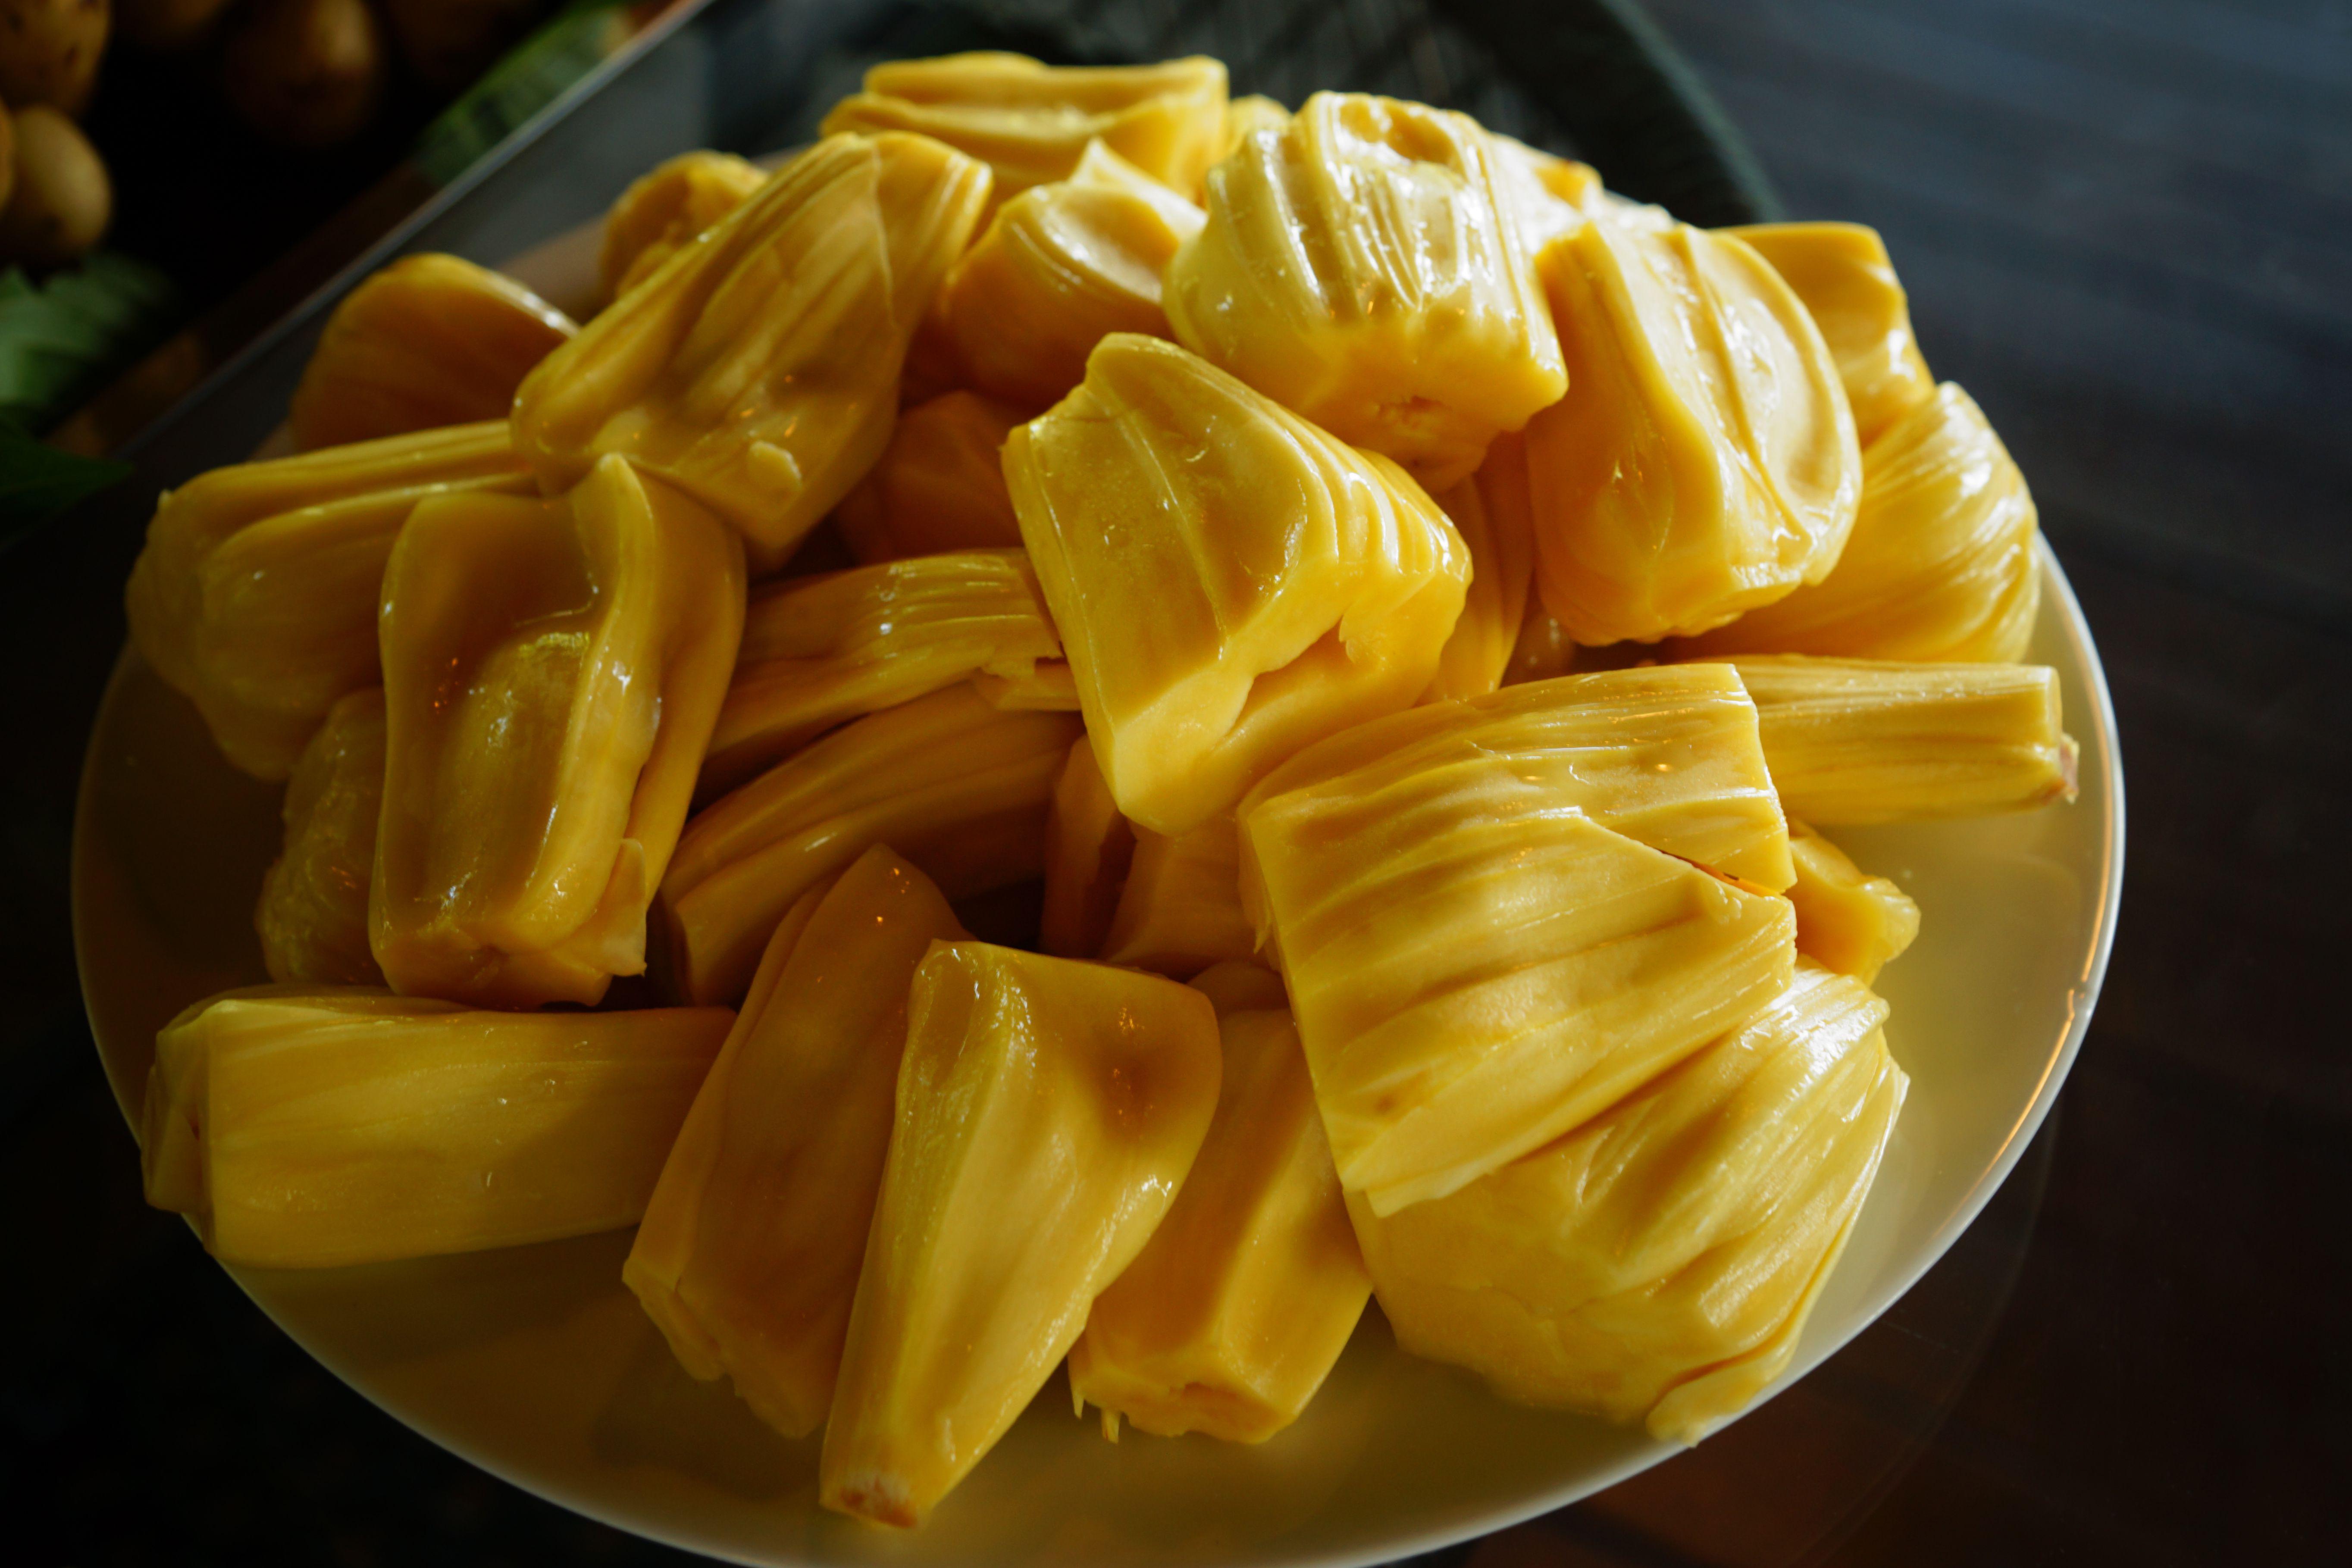 Jackfruit for crudite